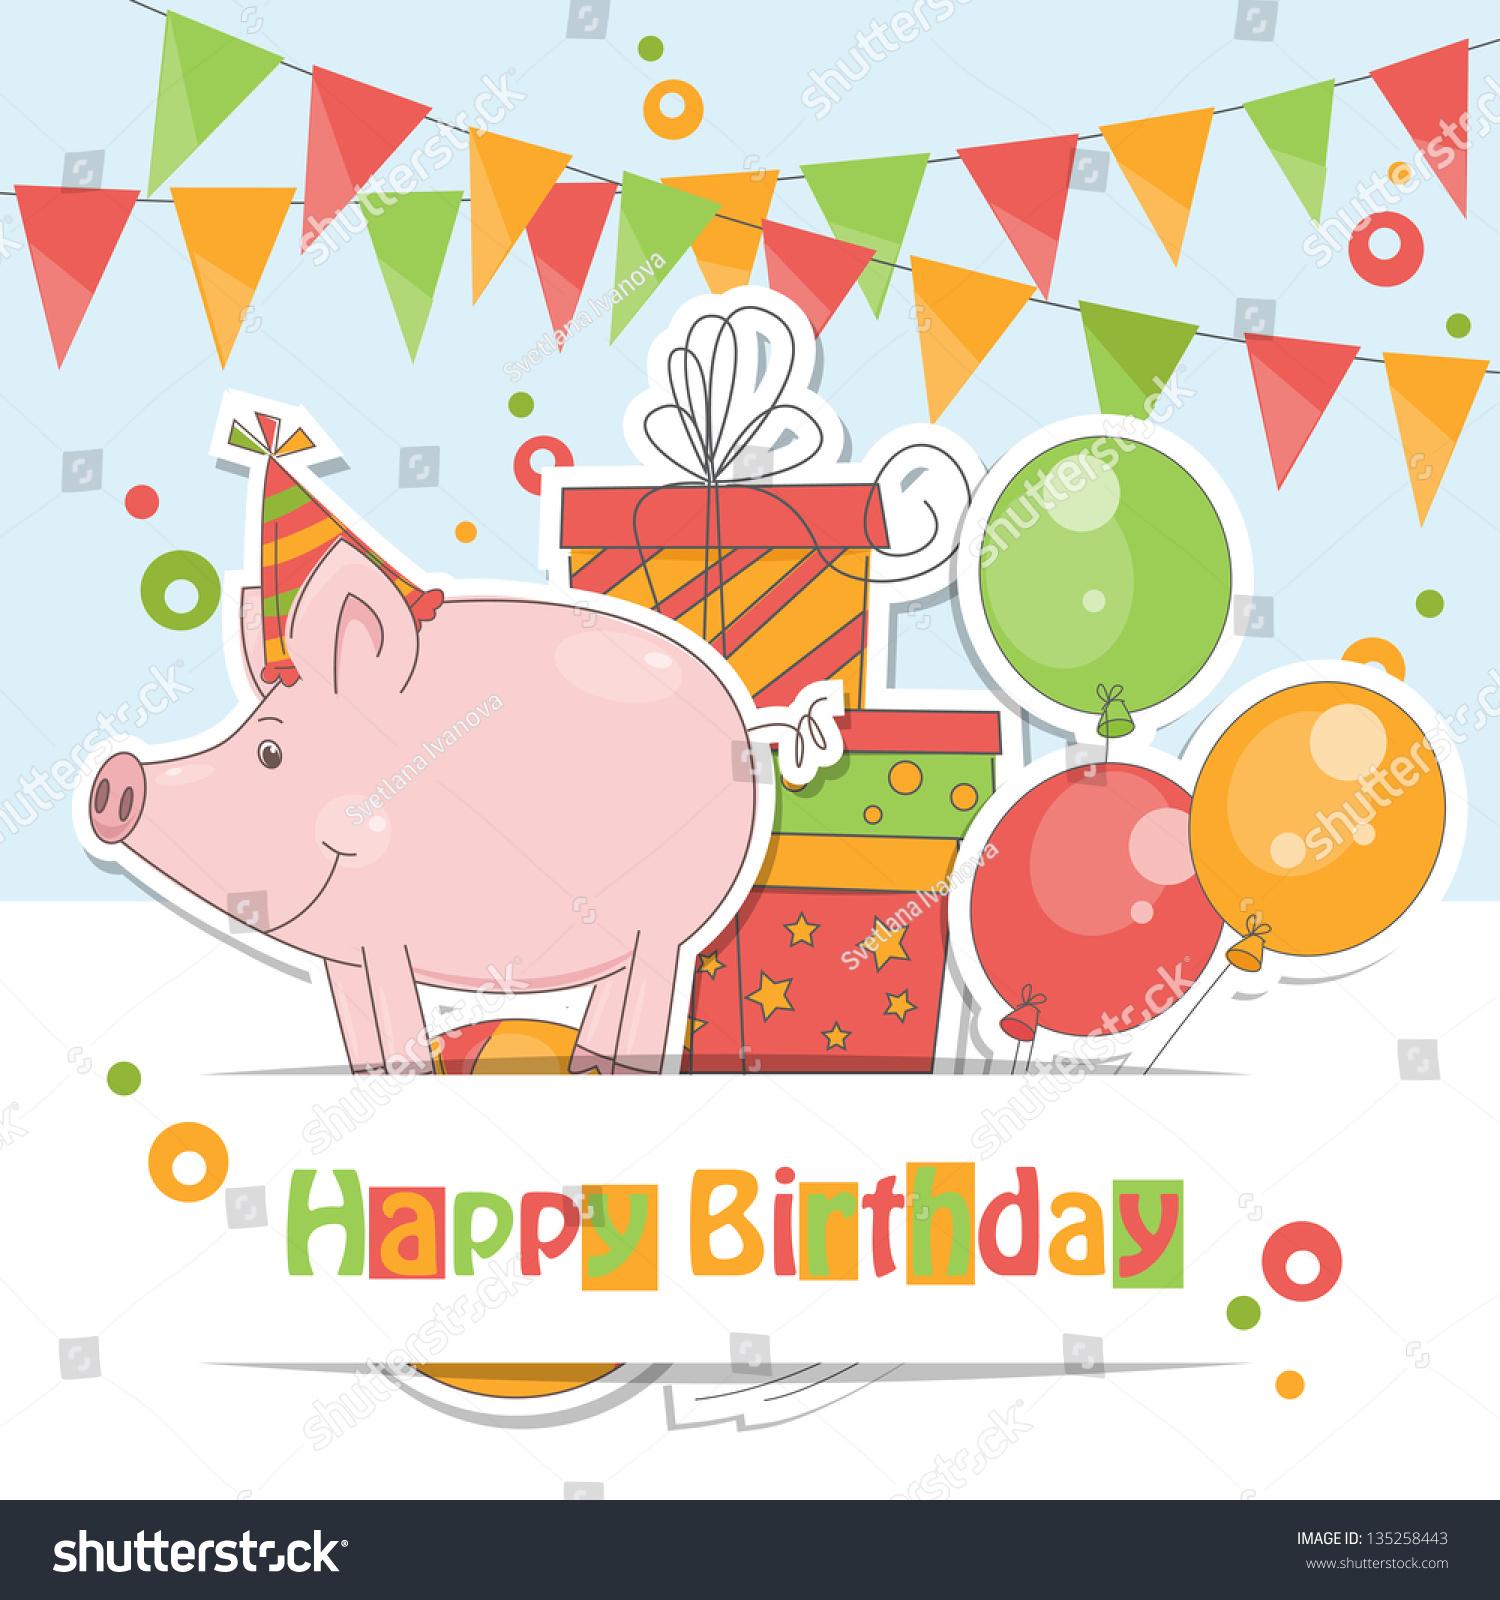 happy birthday card colorful illustration funny stock vector, Birthday card